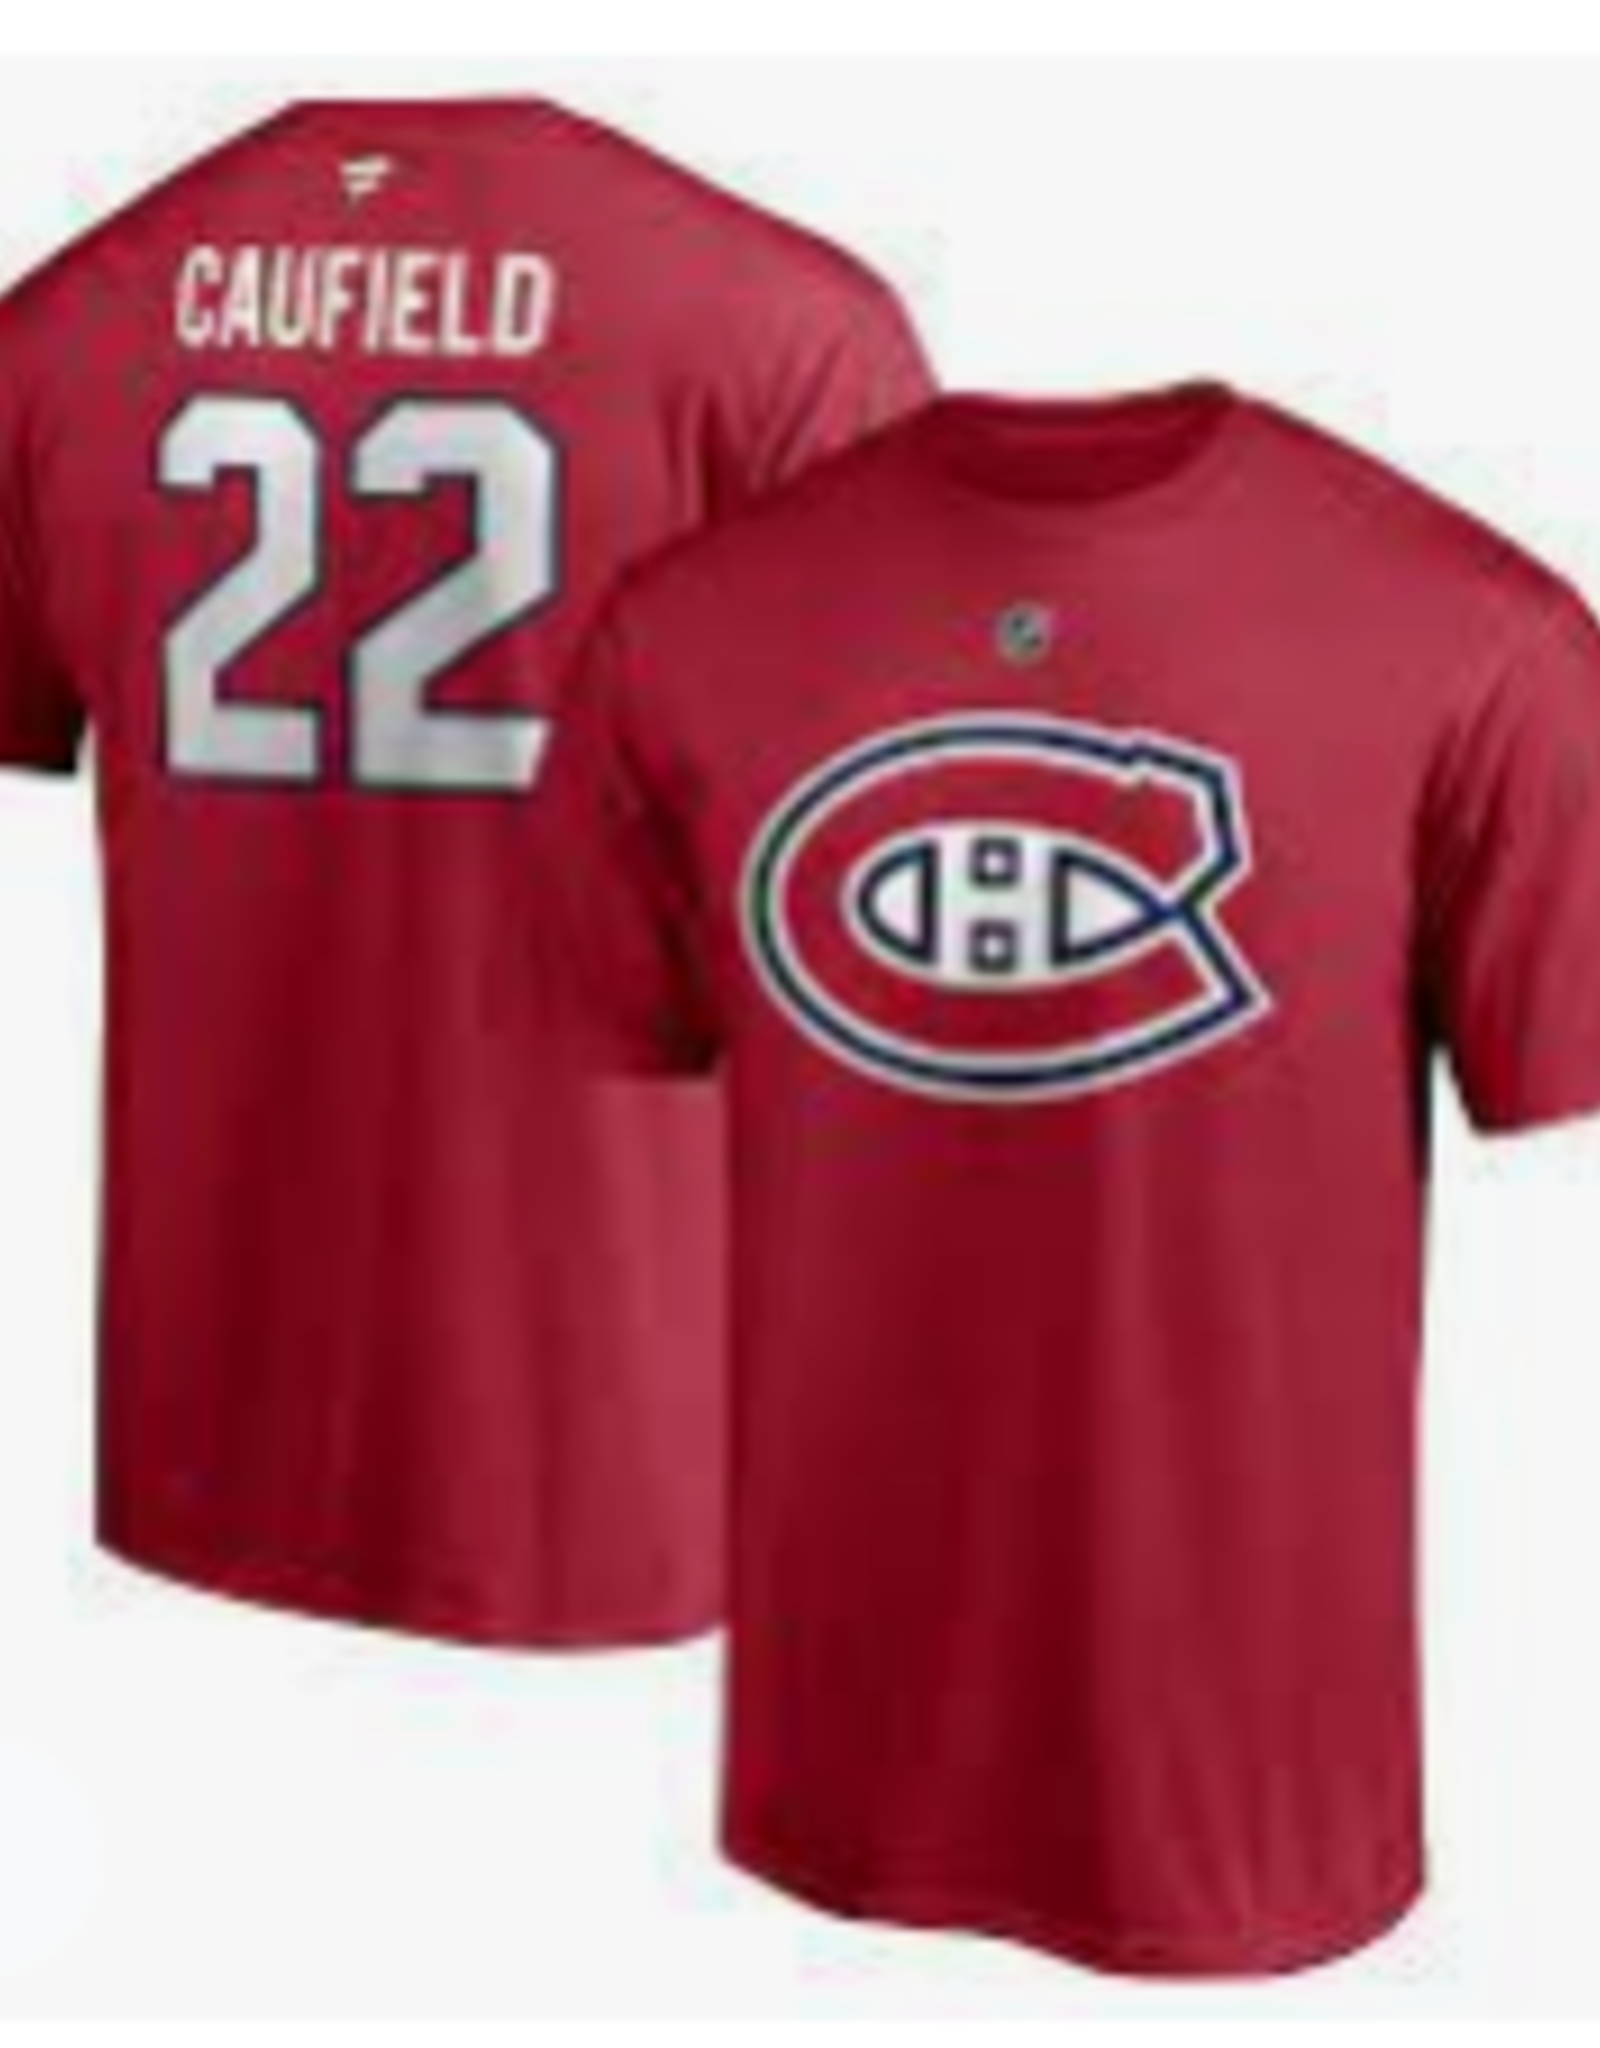 Chandail t-shirt- 22 Cole Caufield NHL Officiel Youth